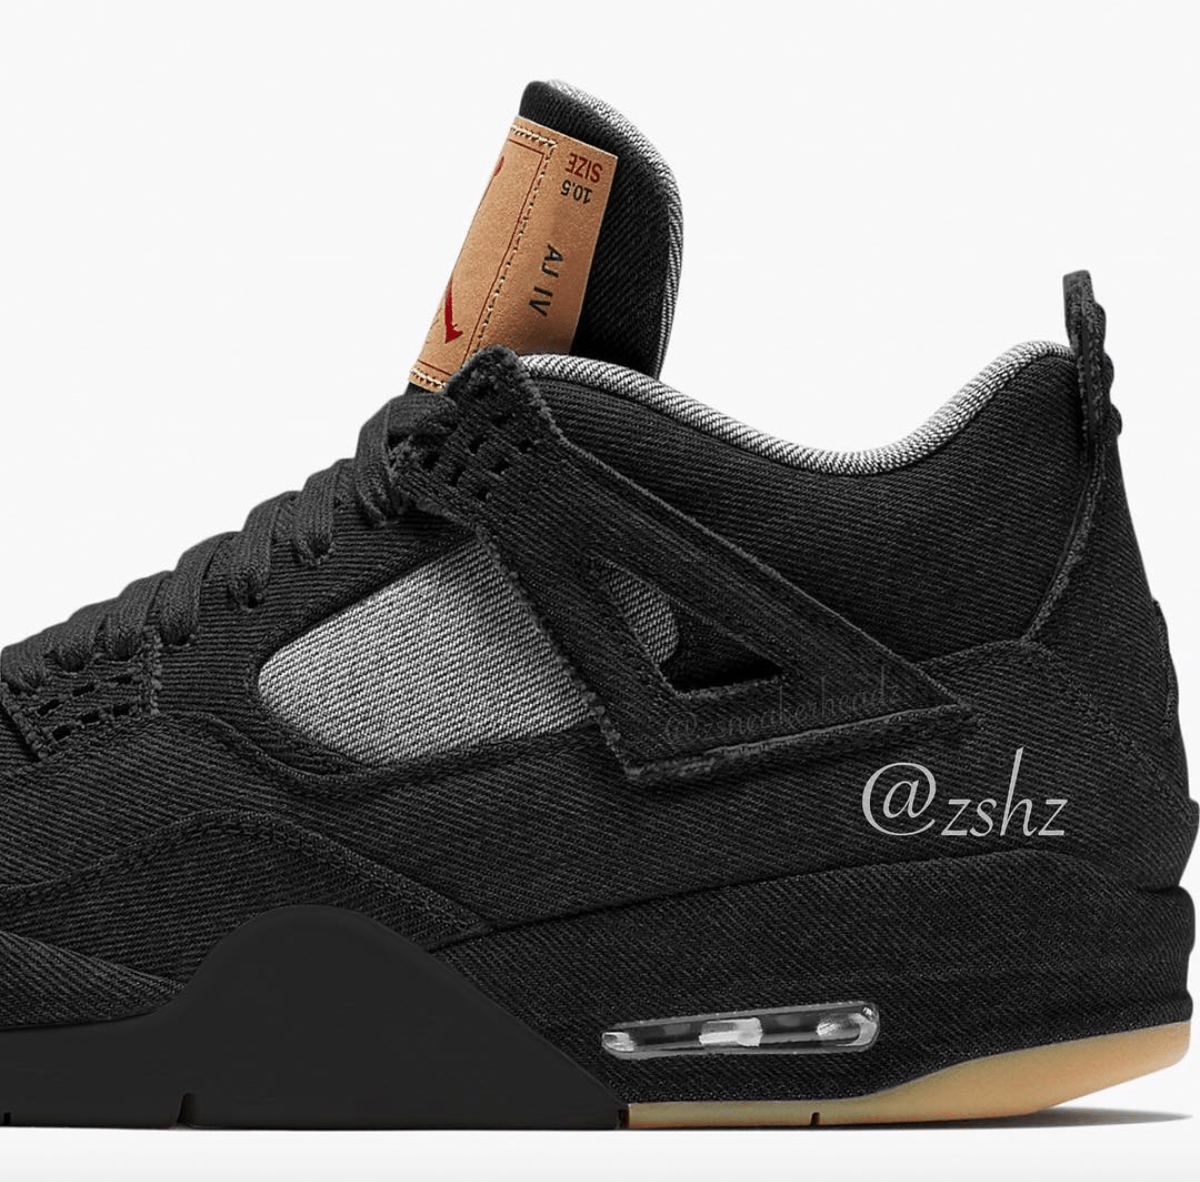 5e453ecabfc1 Levi s x Air Jordan Retro 4 in Alternative Black Rumored To Drop ...